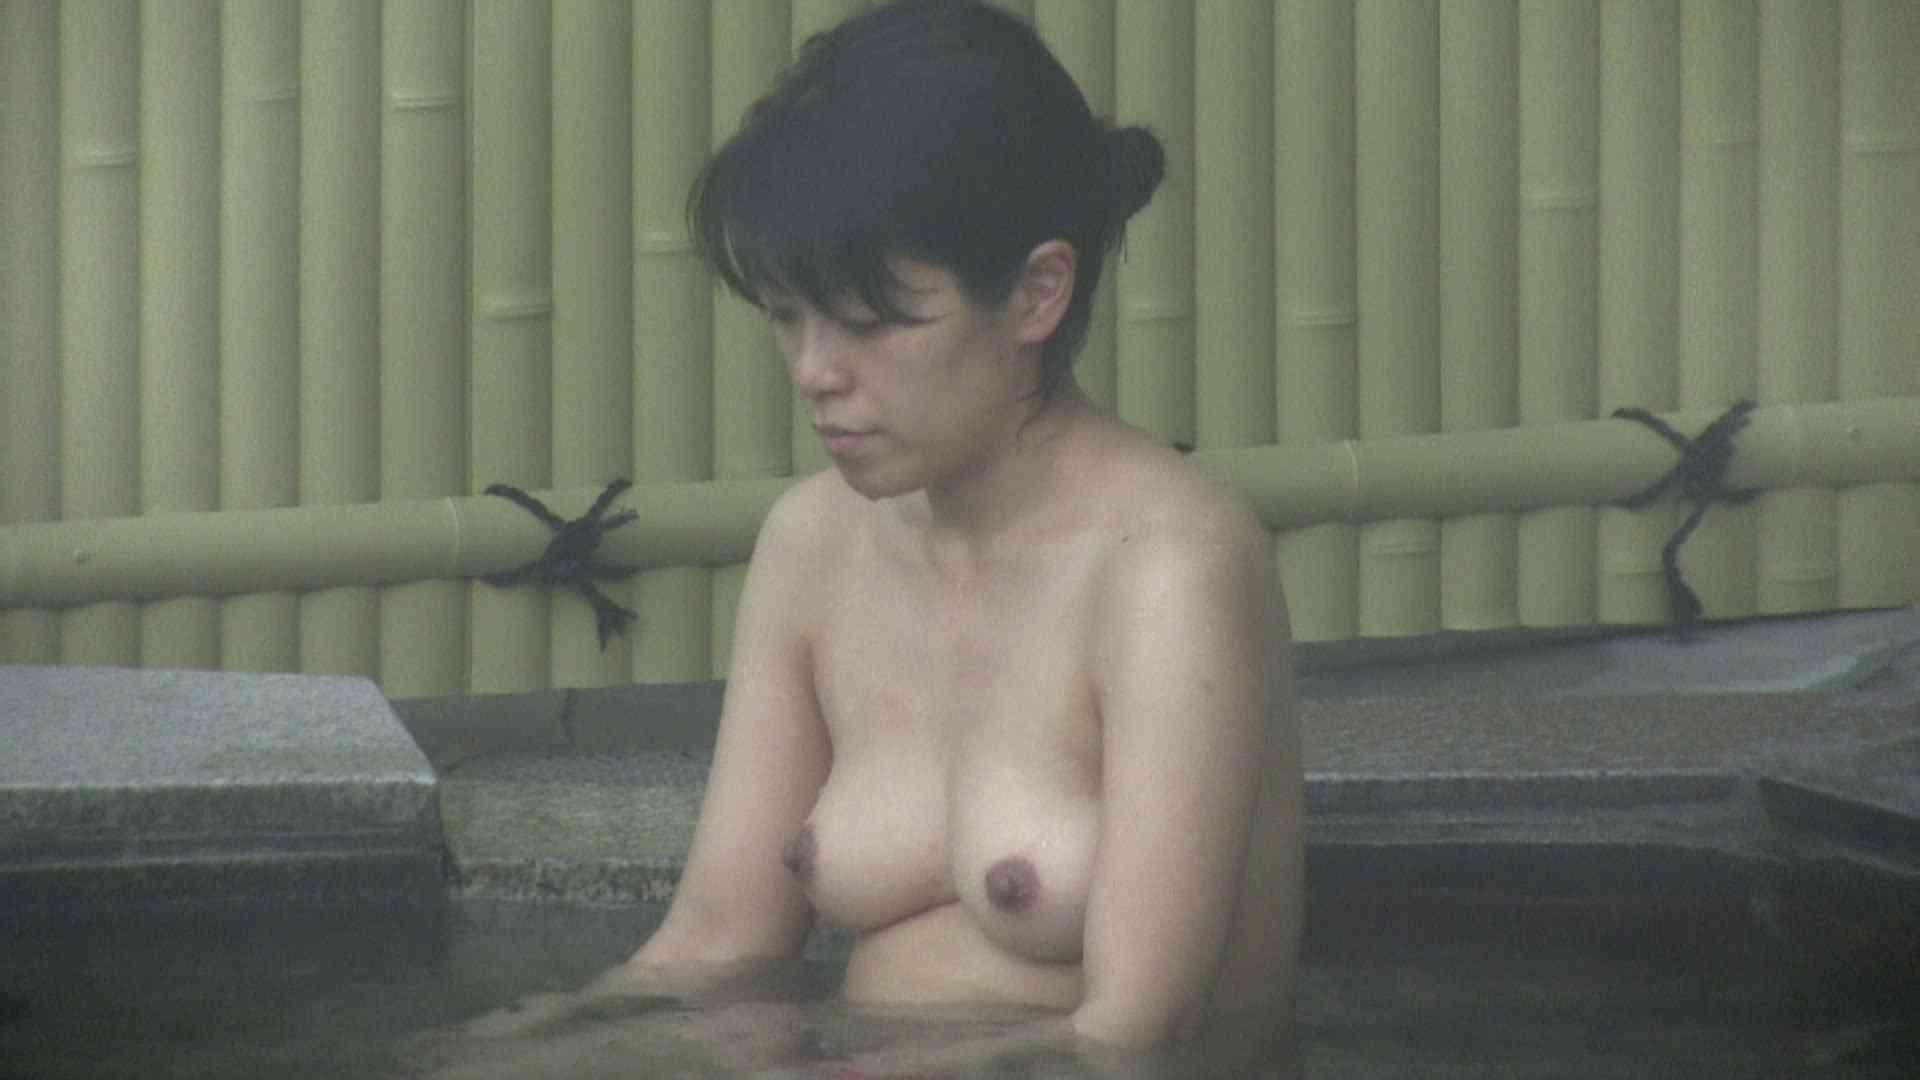 Aquaな露天風呂Vol.585 露天 アダルト動画キャプチャ 78PICs 59